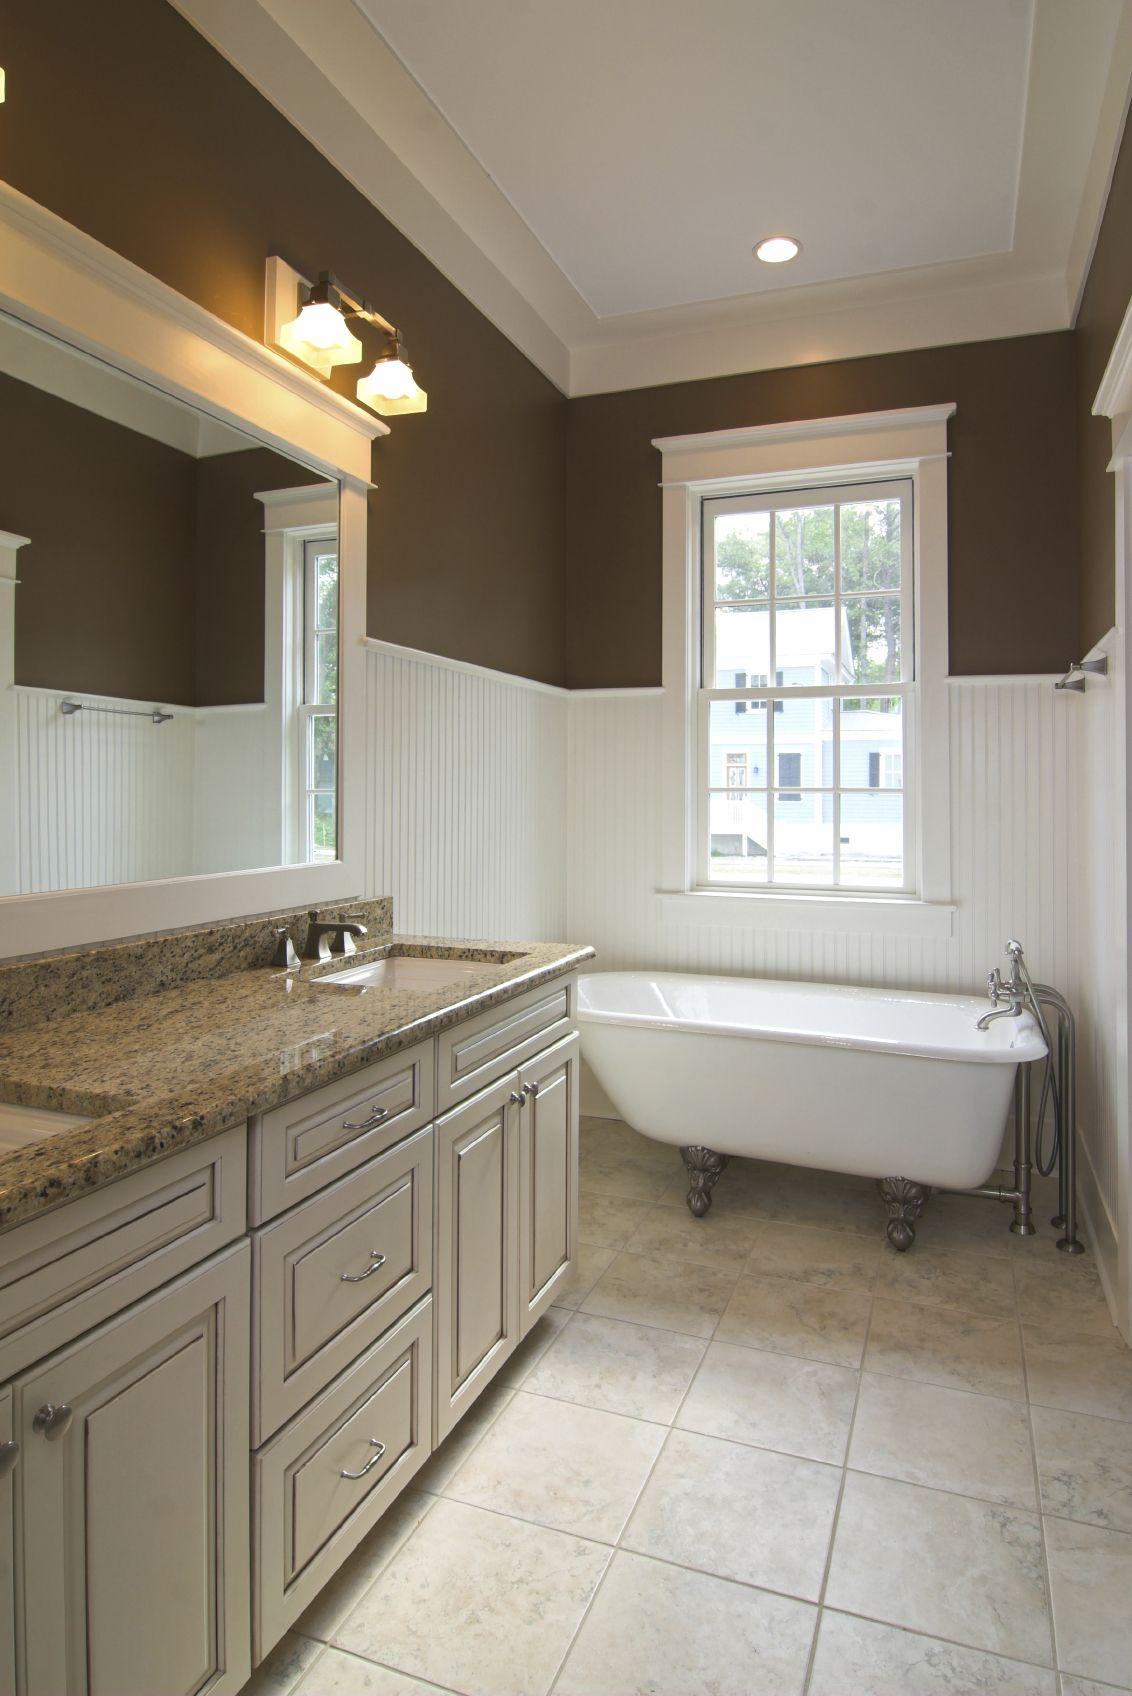 Bathroom Lighting Needs wainscoting, large tile floor, updated cabinet - needs white/light